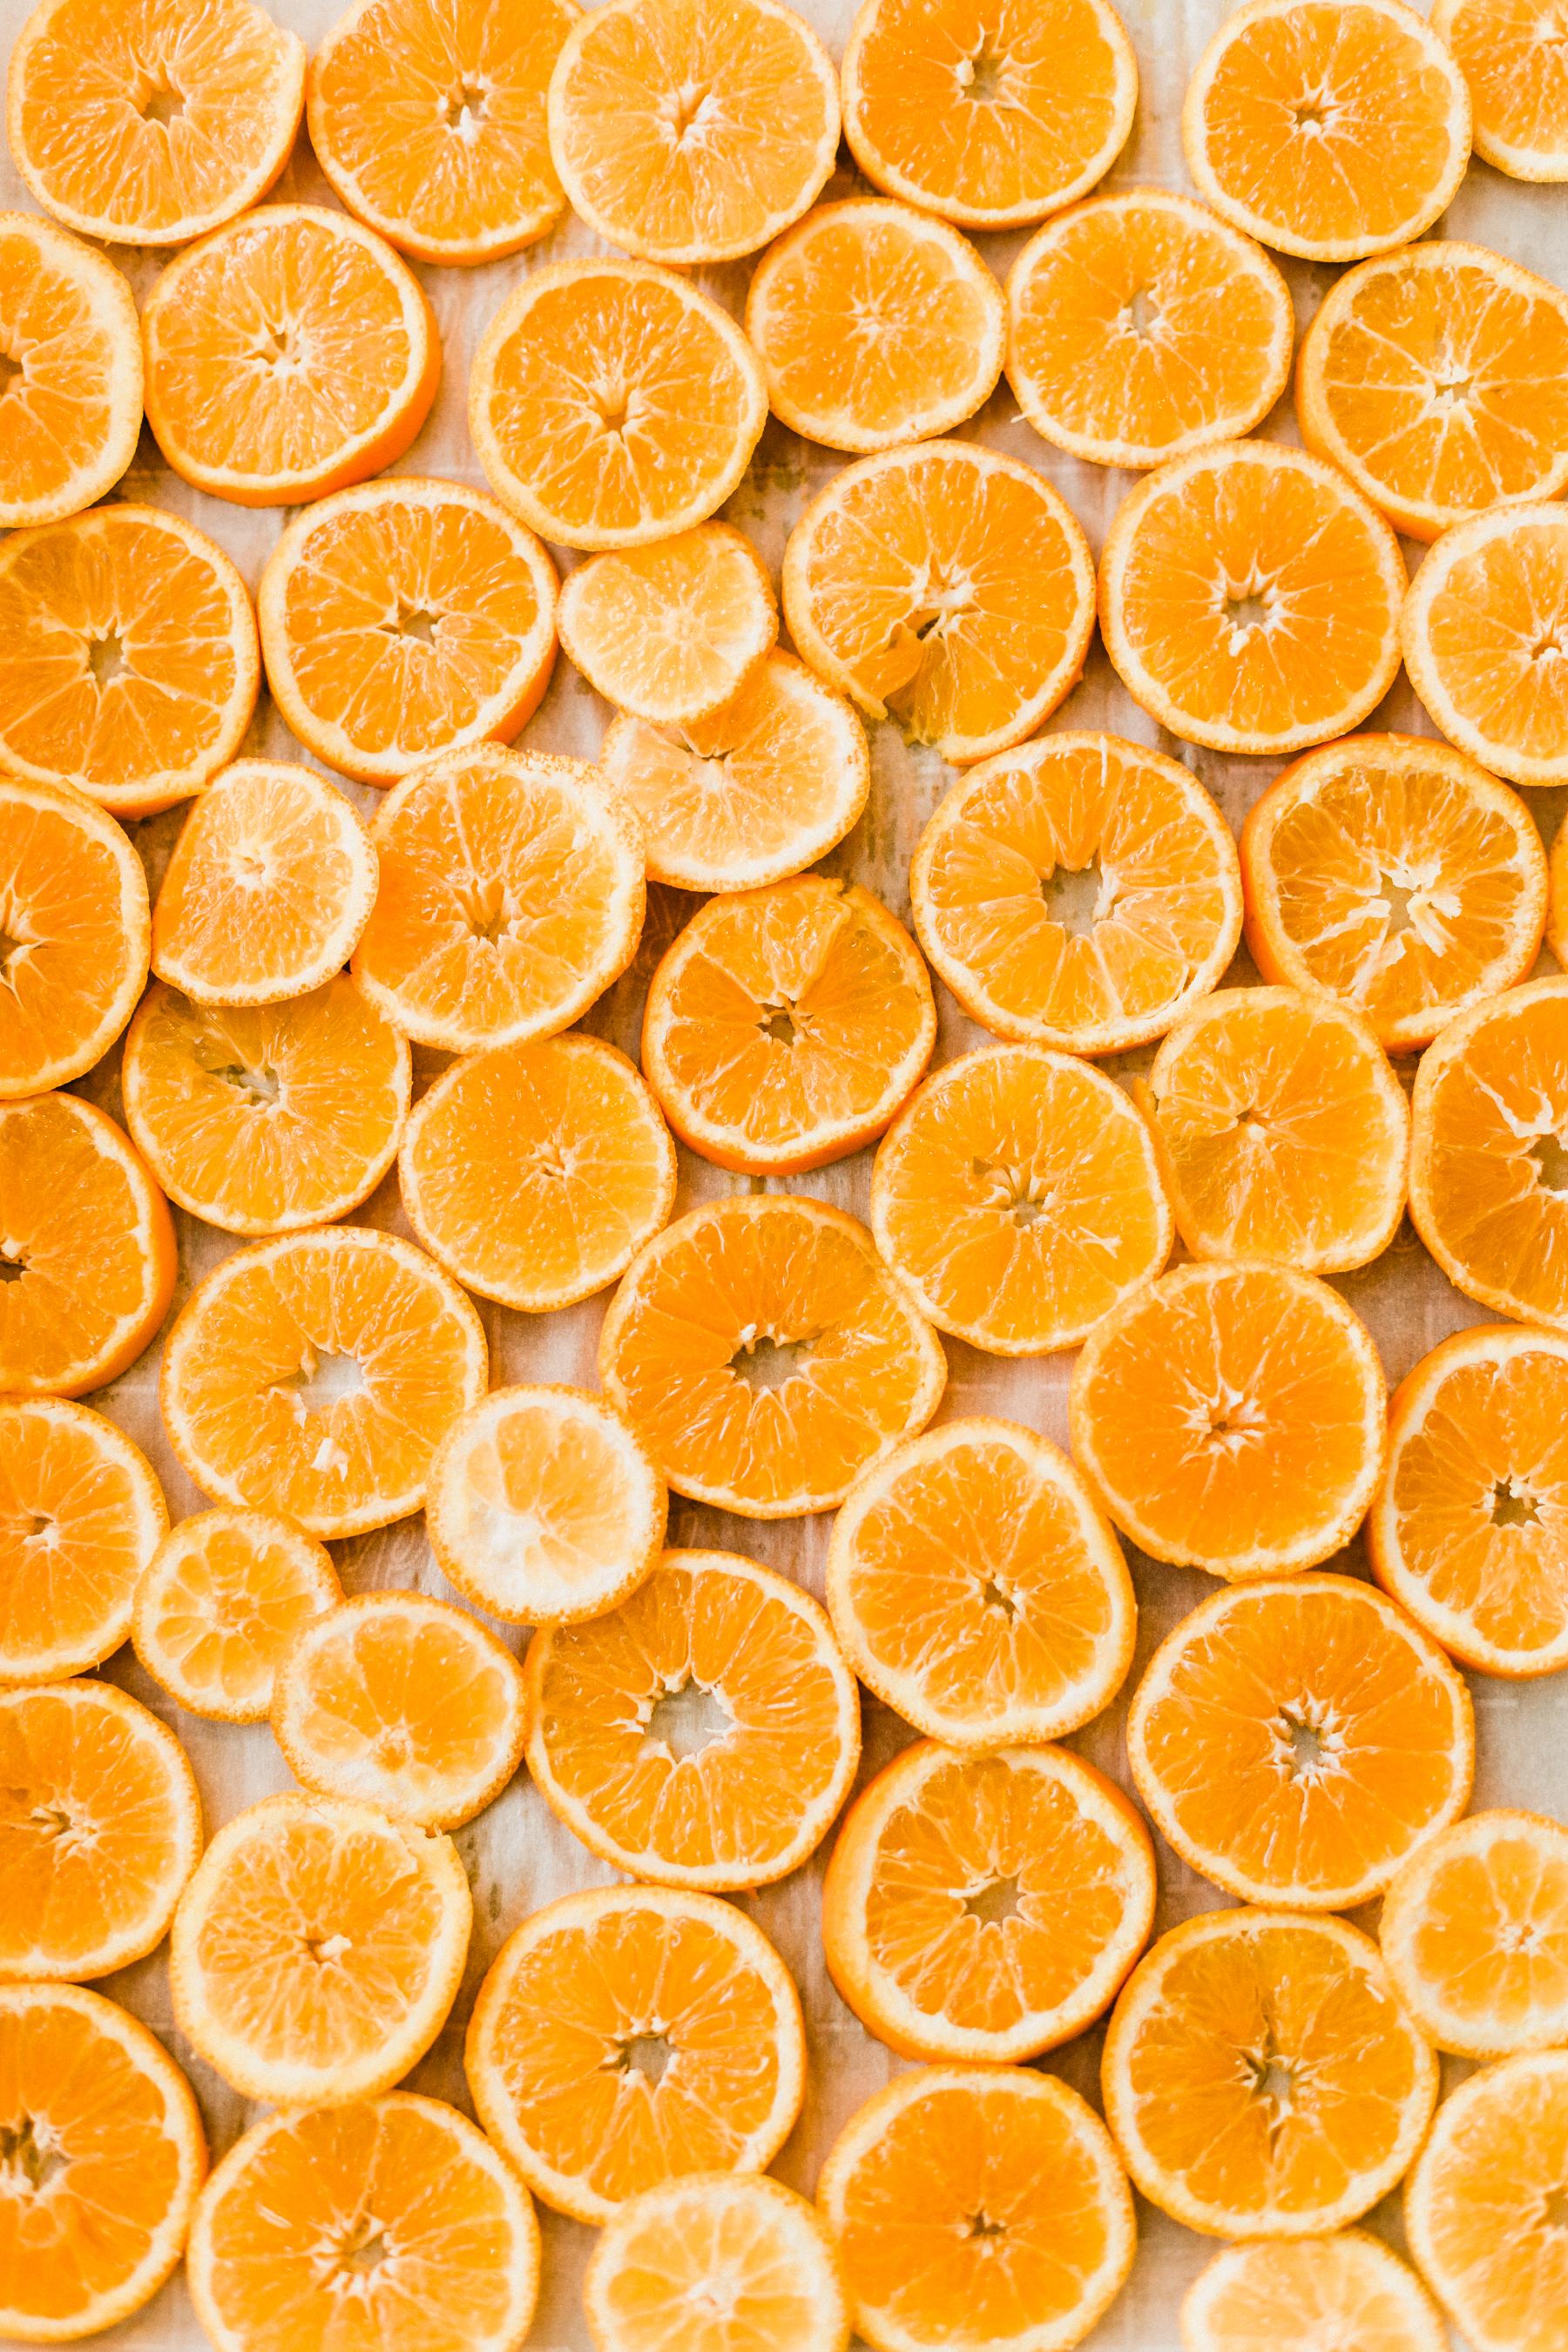 Oranges-6.jpg